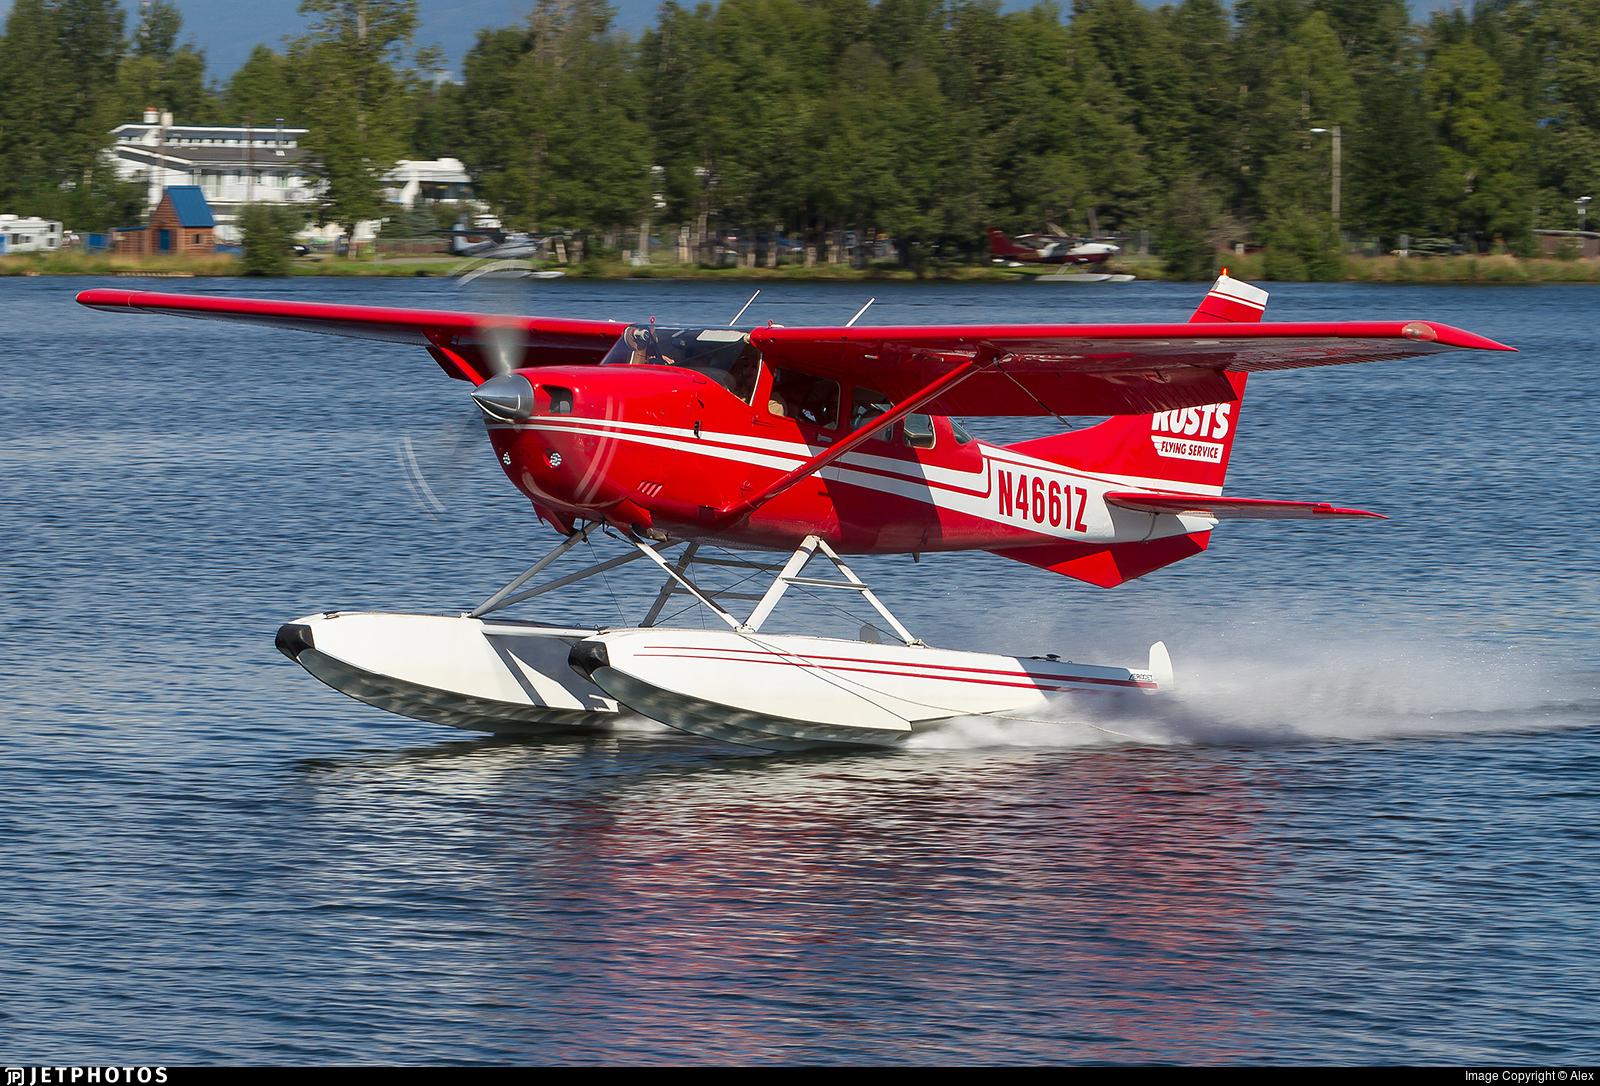 N4661Z - Cessna U206G Stationair - Rust's Flying Service